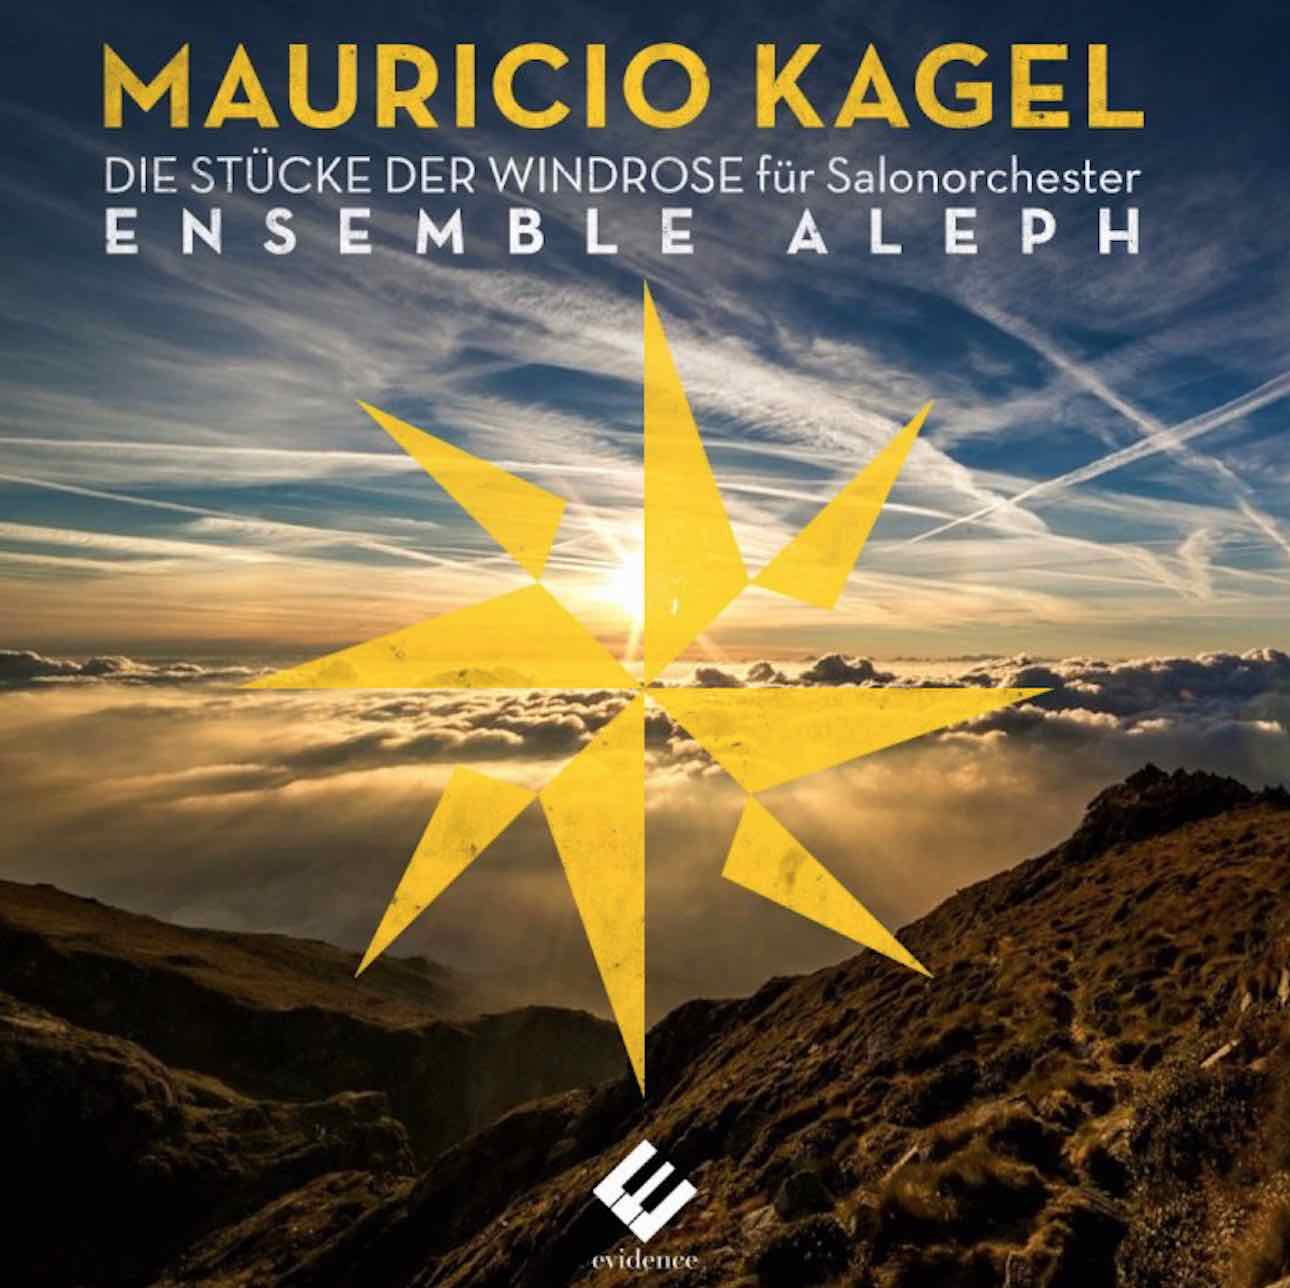 Die Stücke der Windrose für Salonorchester  by  Mauricio Kagel   Ensemble Aleph  (Evidence Classics, December 2016)  Reviewed by  Paul Kilbey